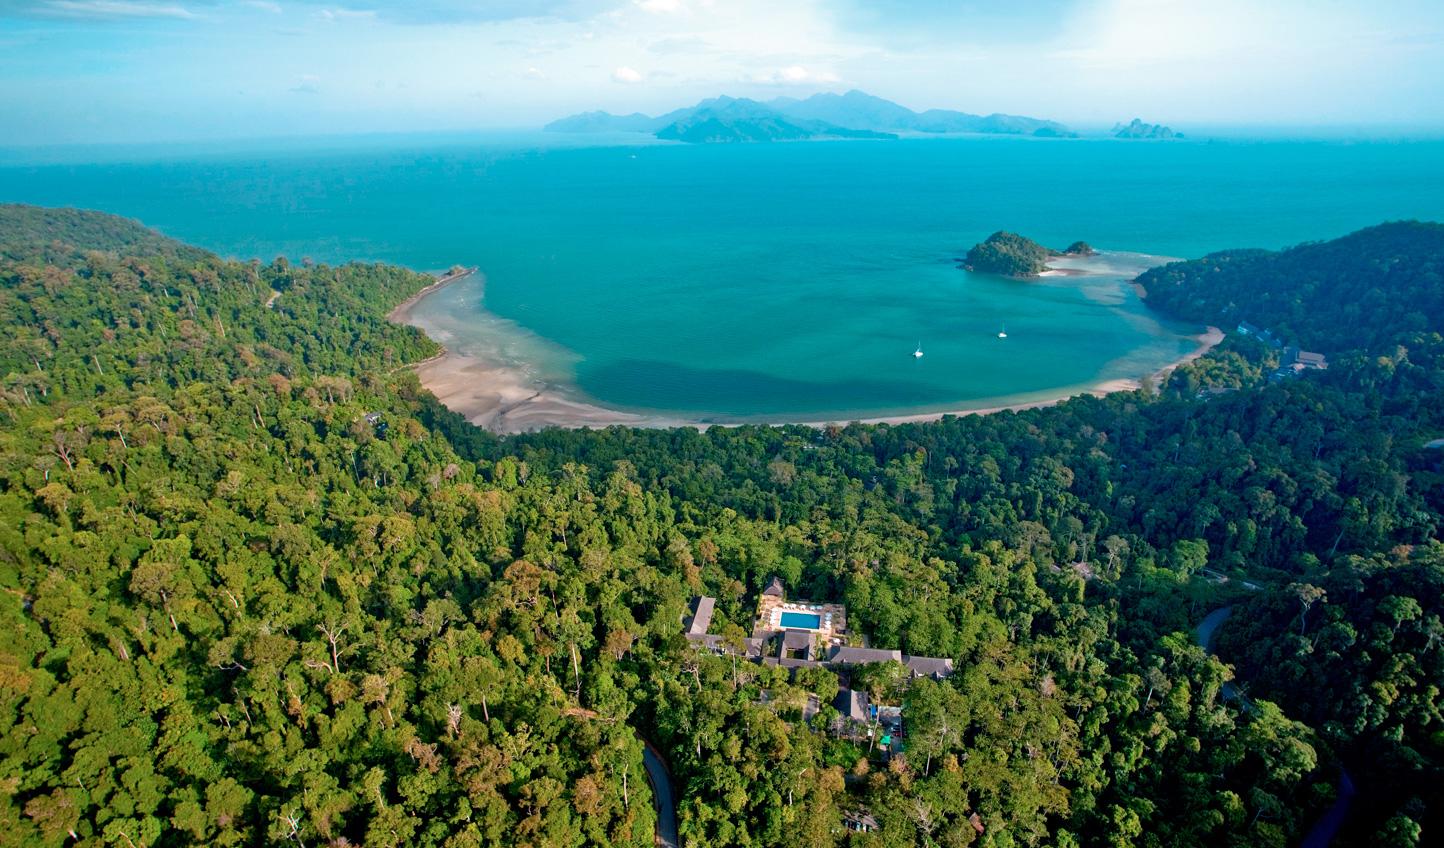 Datai - your island oasis on Langkawi